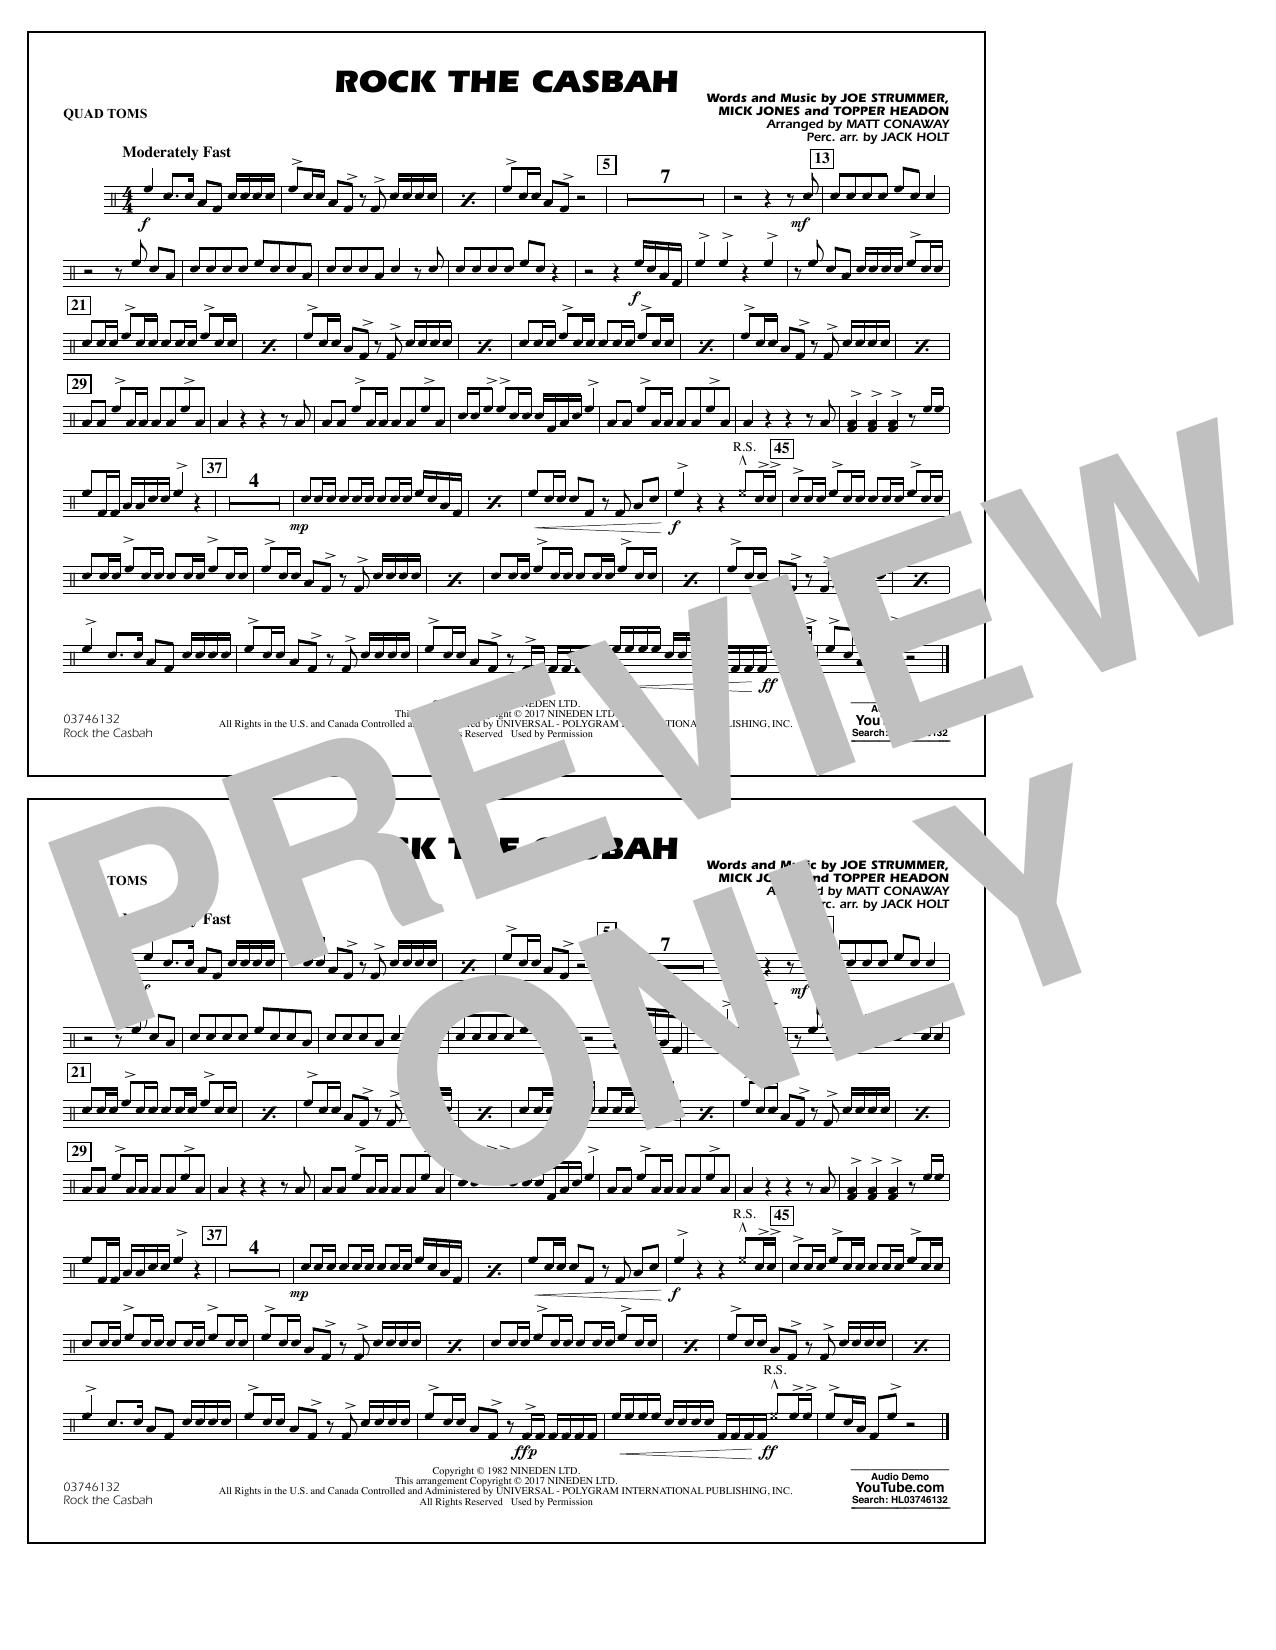 Rock the Casbah - Quad Toms Sheet Music